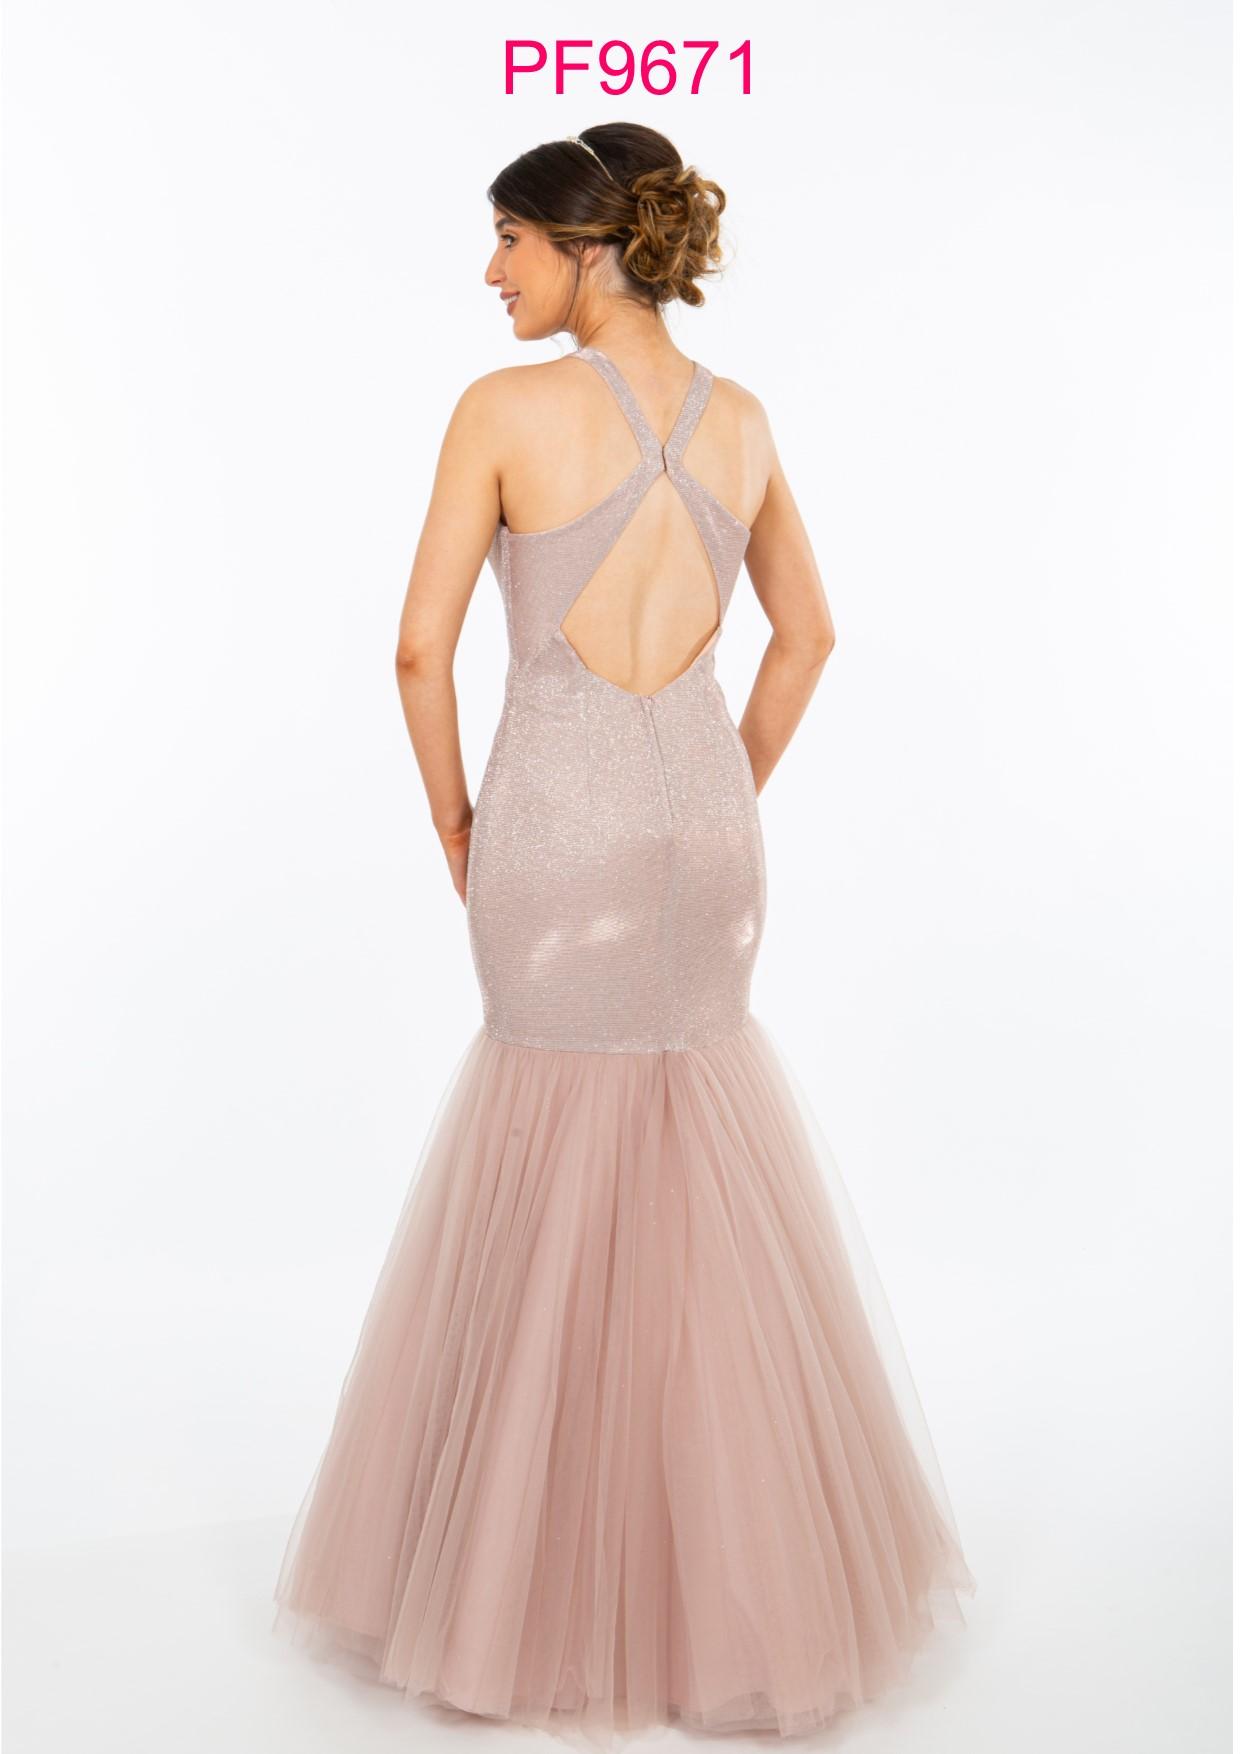 Prom Frocks PF9671 Nude Pink Prom Gown | Carlisle Cumbria